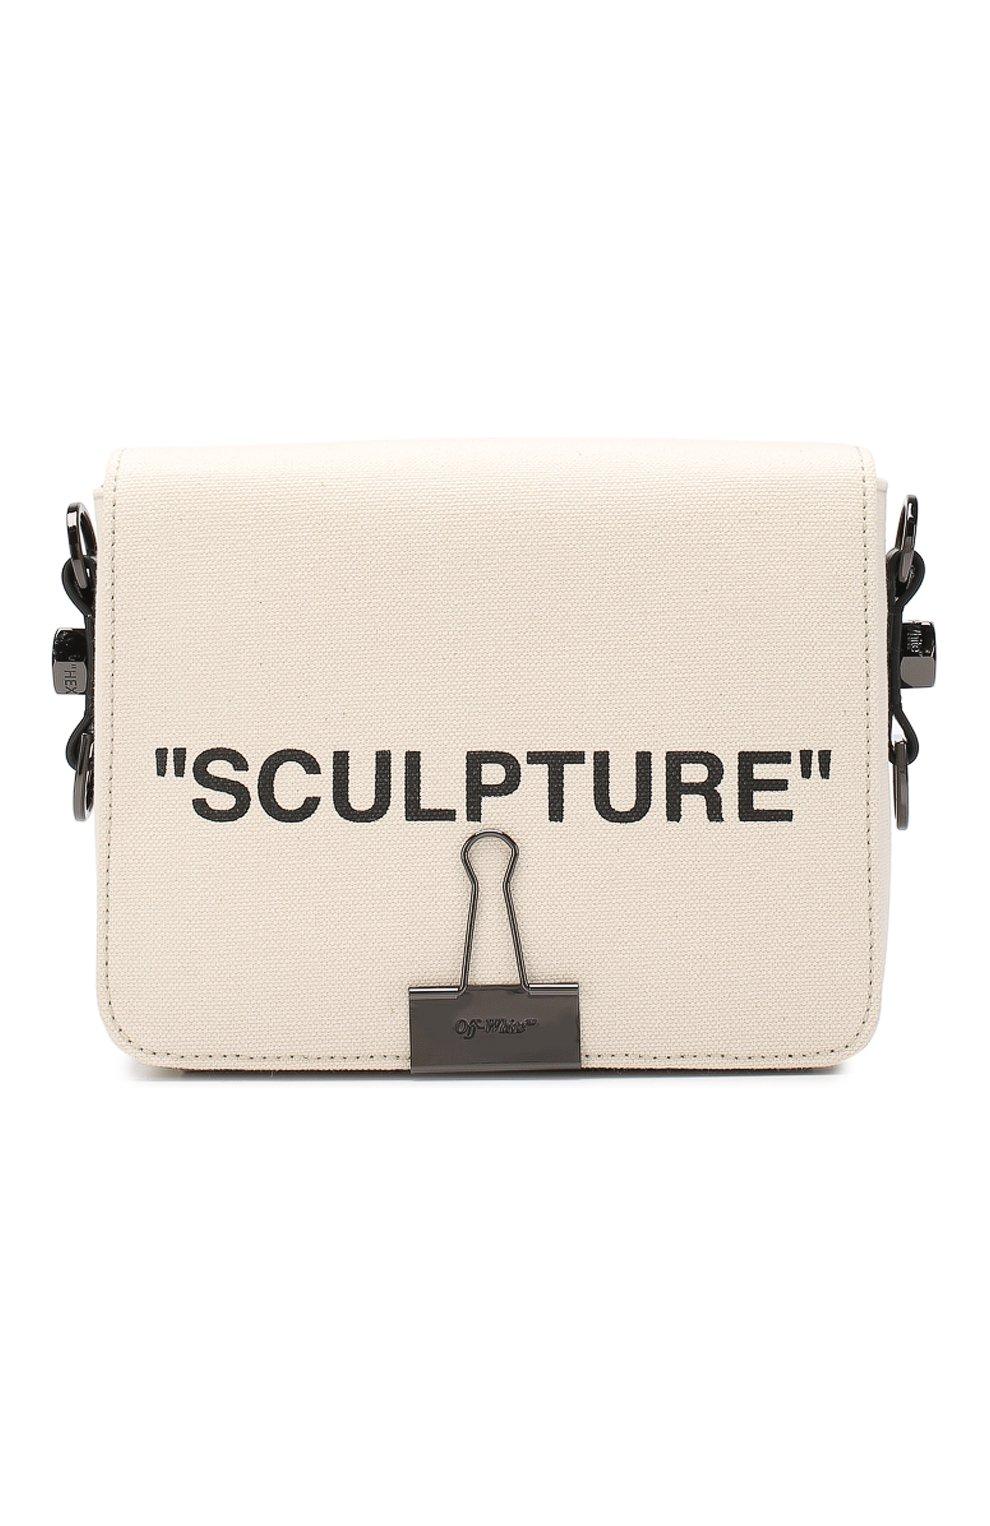 Сумка Sculpture Binder Clip Off-White бежевая цвета   Фото №1